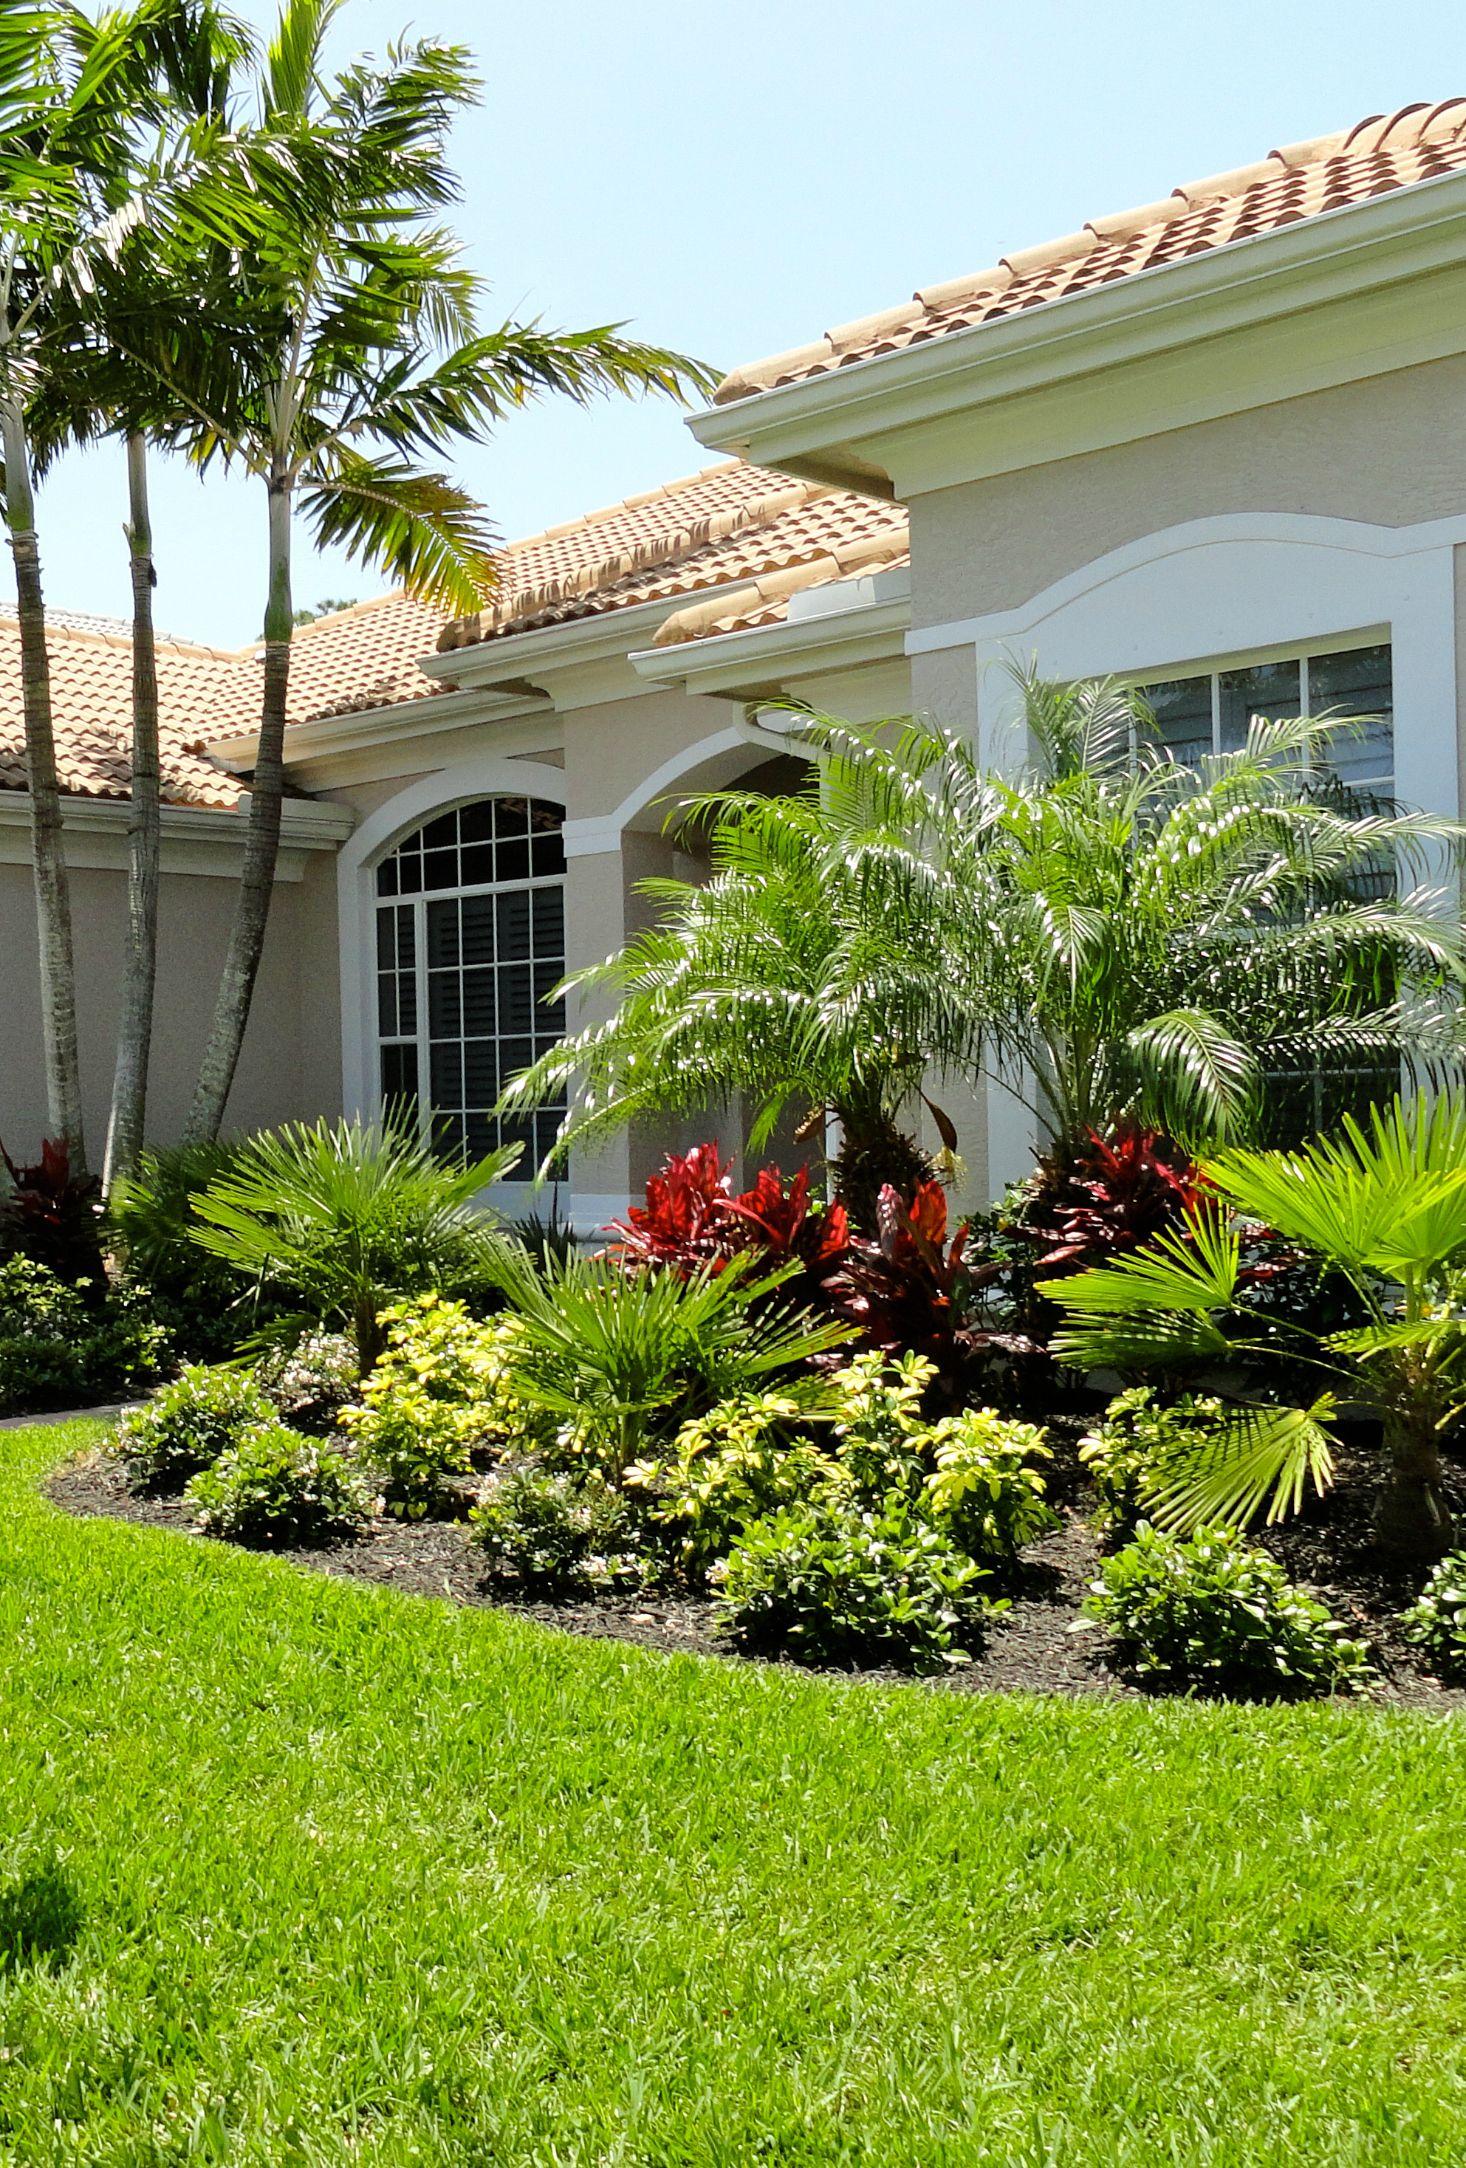 . Popular Backyard Landscape Design for an Appealing ...